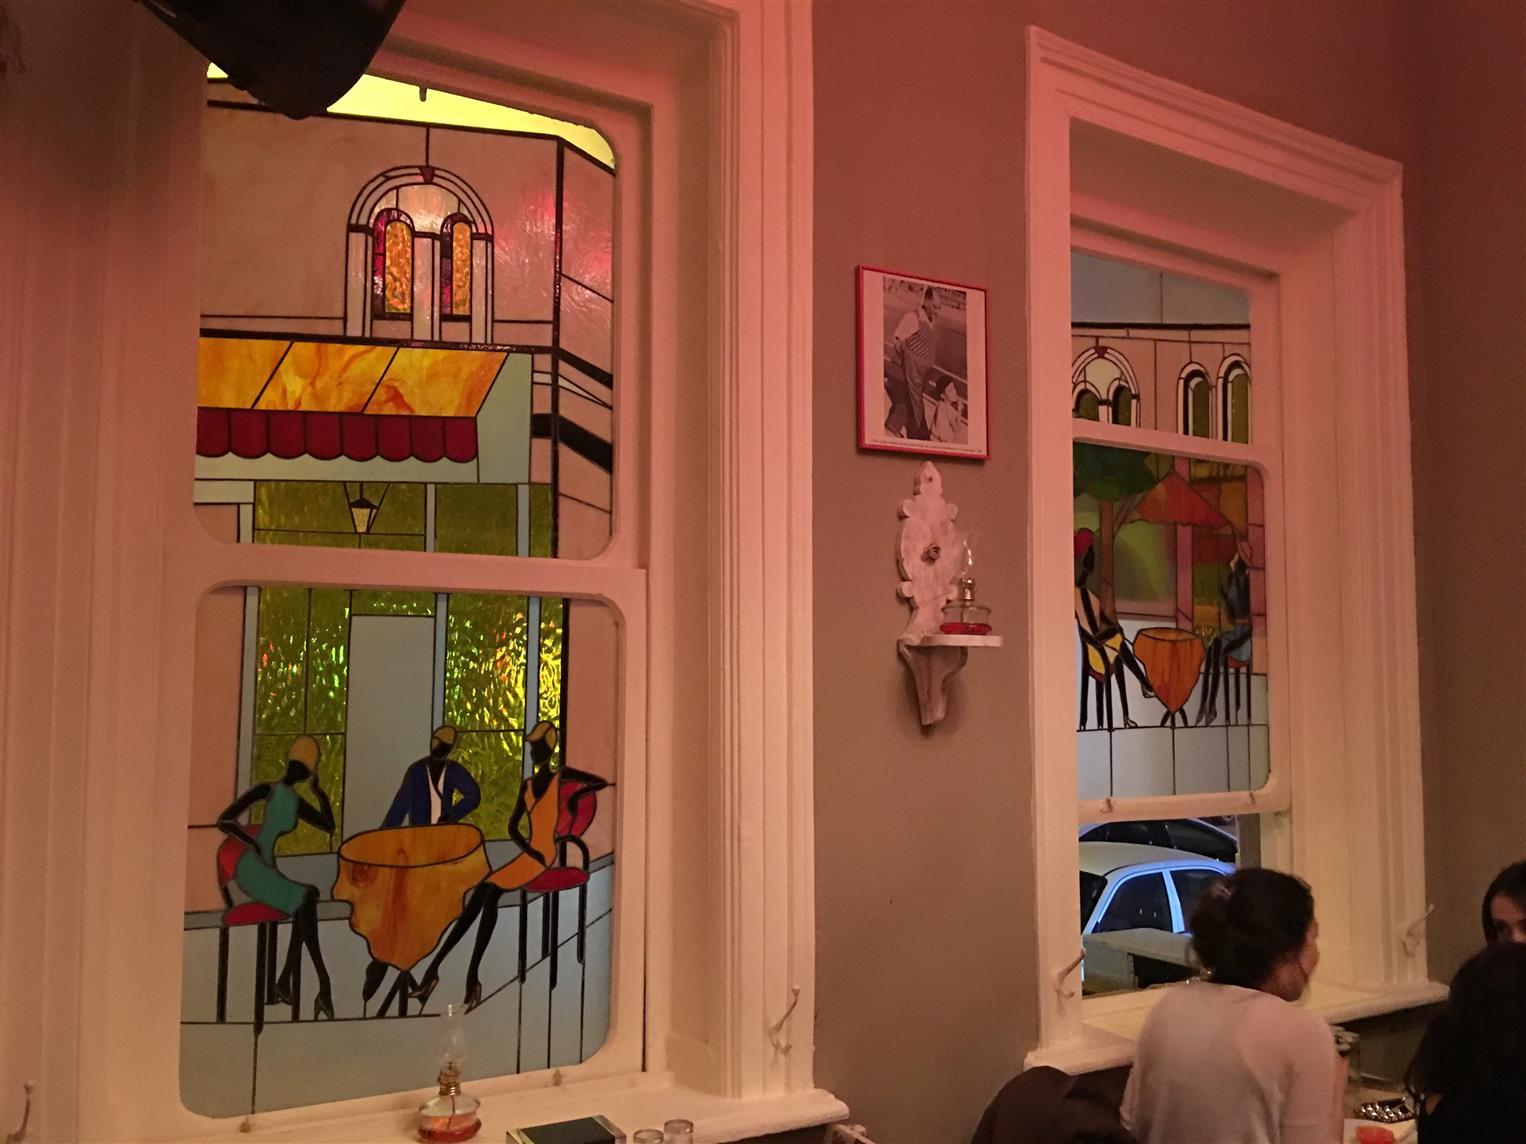 maitia-restoran-guzelyali201652135850325.jpg izmir vitray çalışması